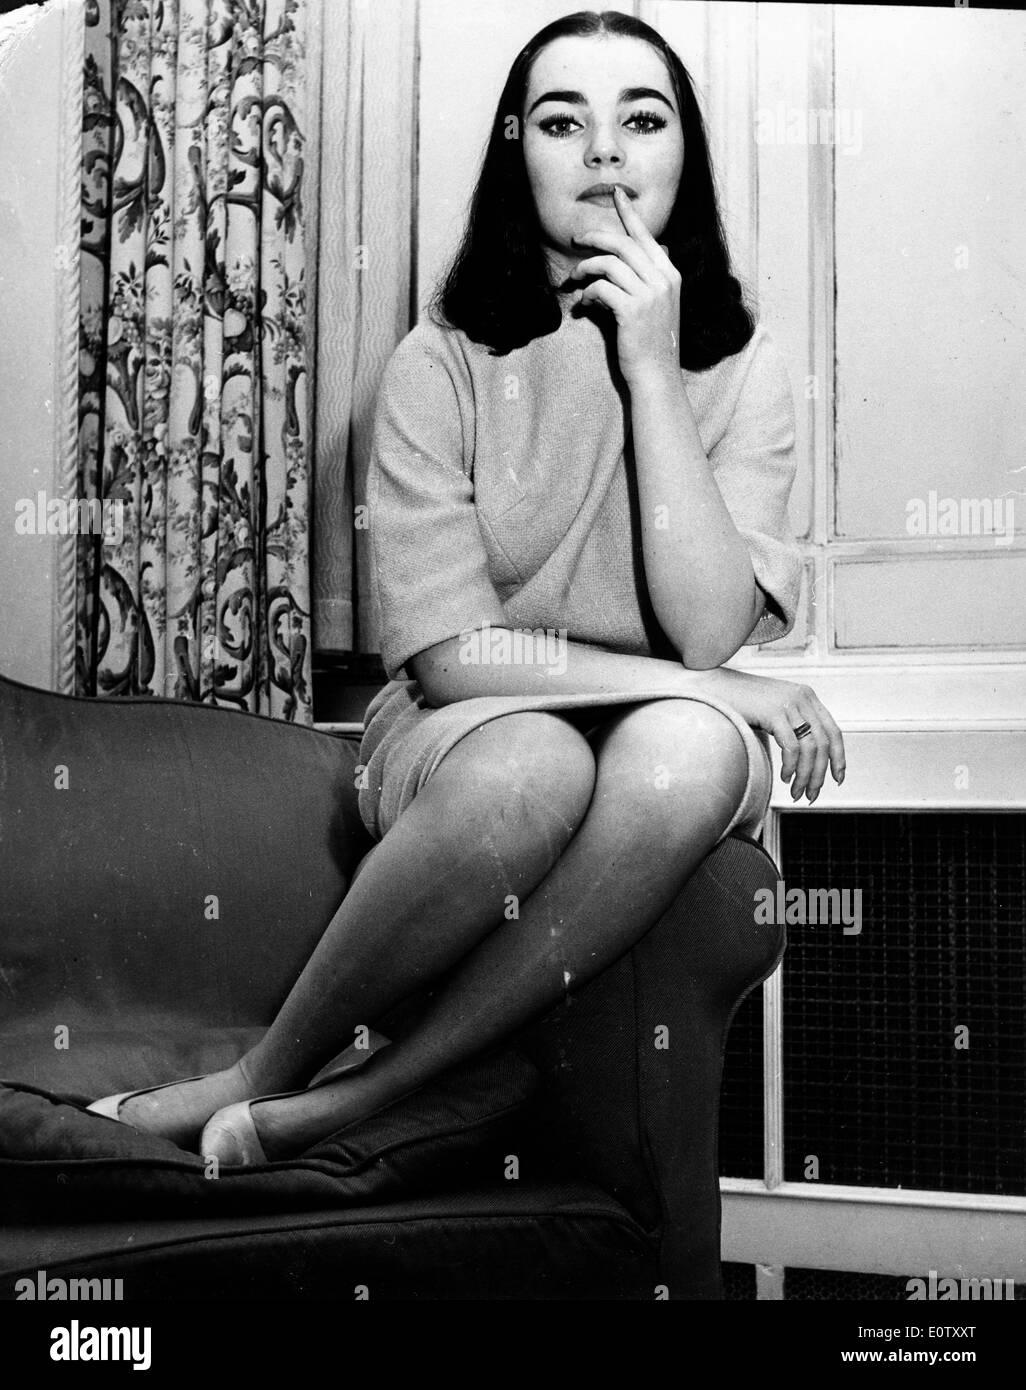 Angela Griffin (born 1976) photo